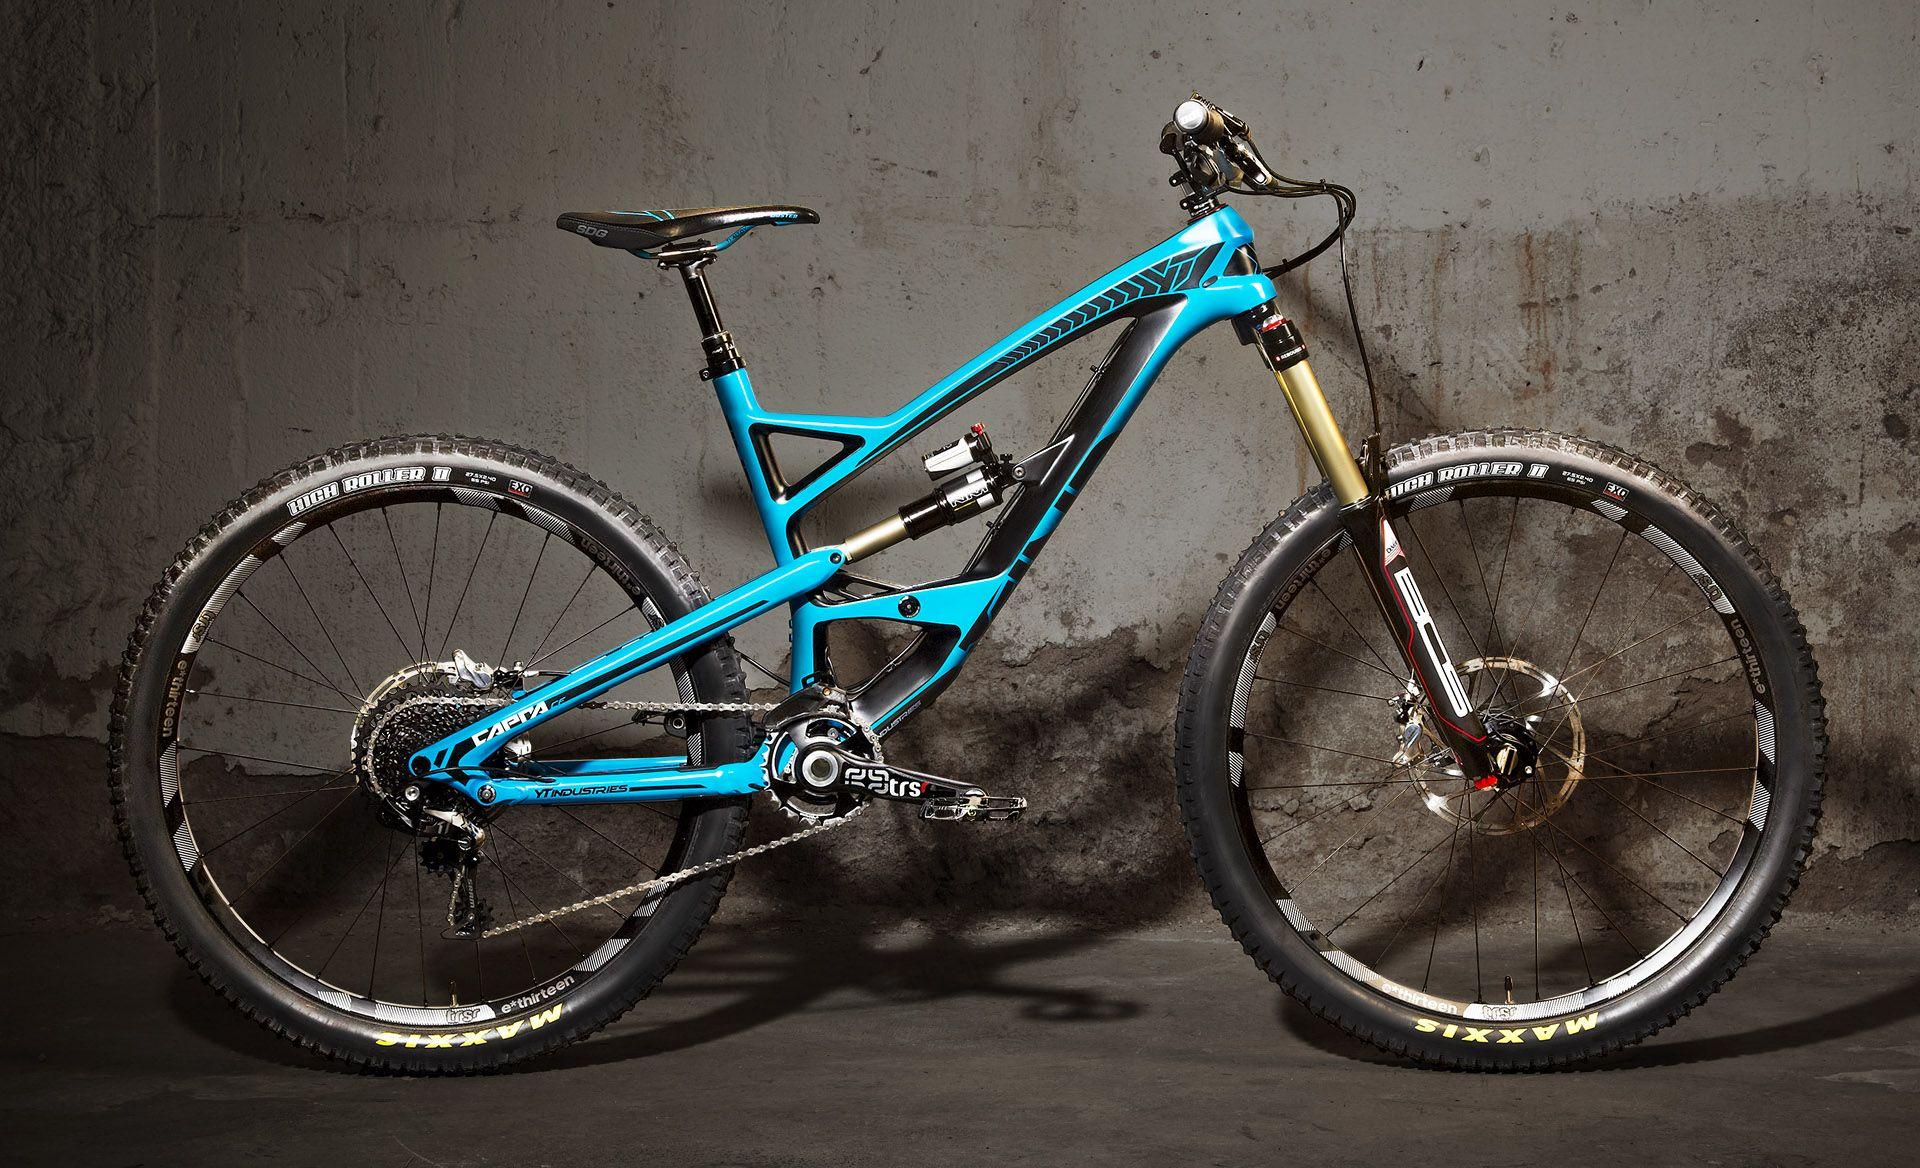 Http Www Yt Industries Com En Products Bikes Enduro 225 Capra Cf